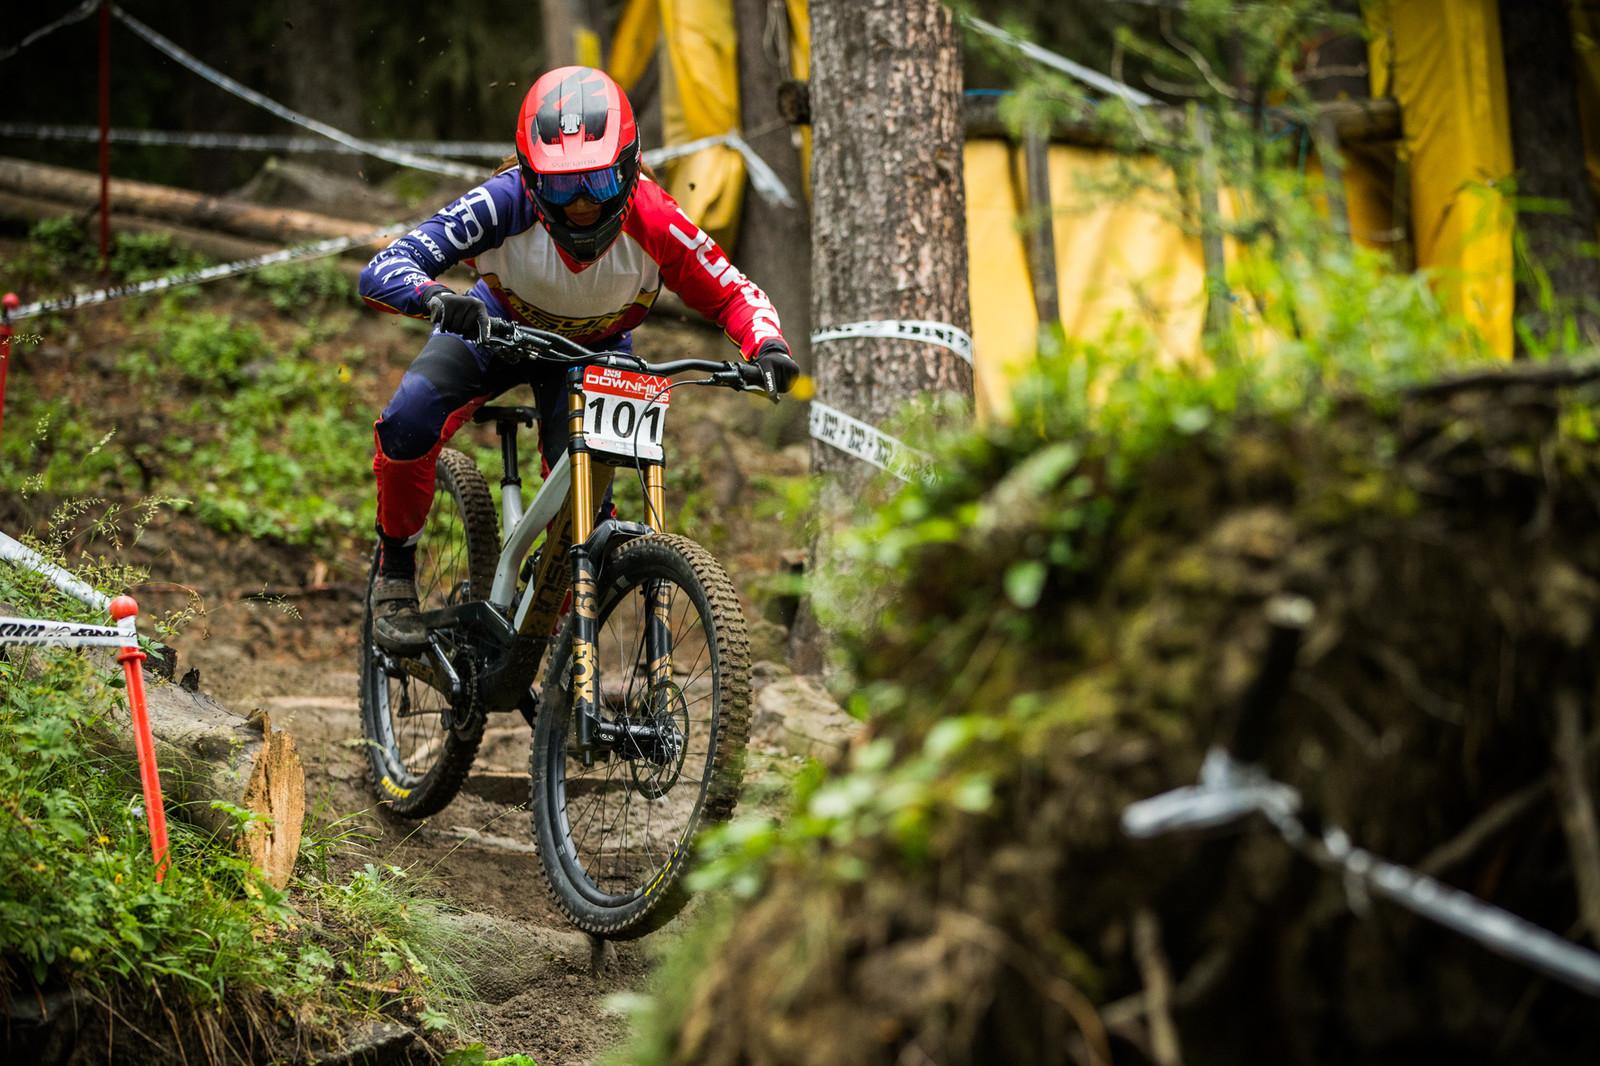 RACE REPORT- 2019 iXS European Downhill Cup, Pila - iXS Downhill Cup Pila - Race Gallery - Mountain Biking Pictures - Vital MTB